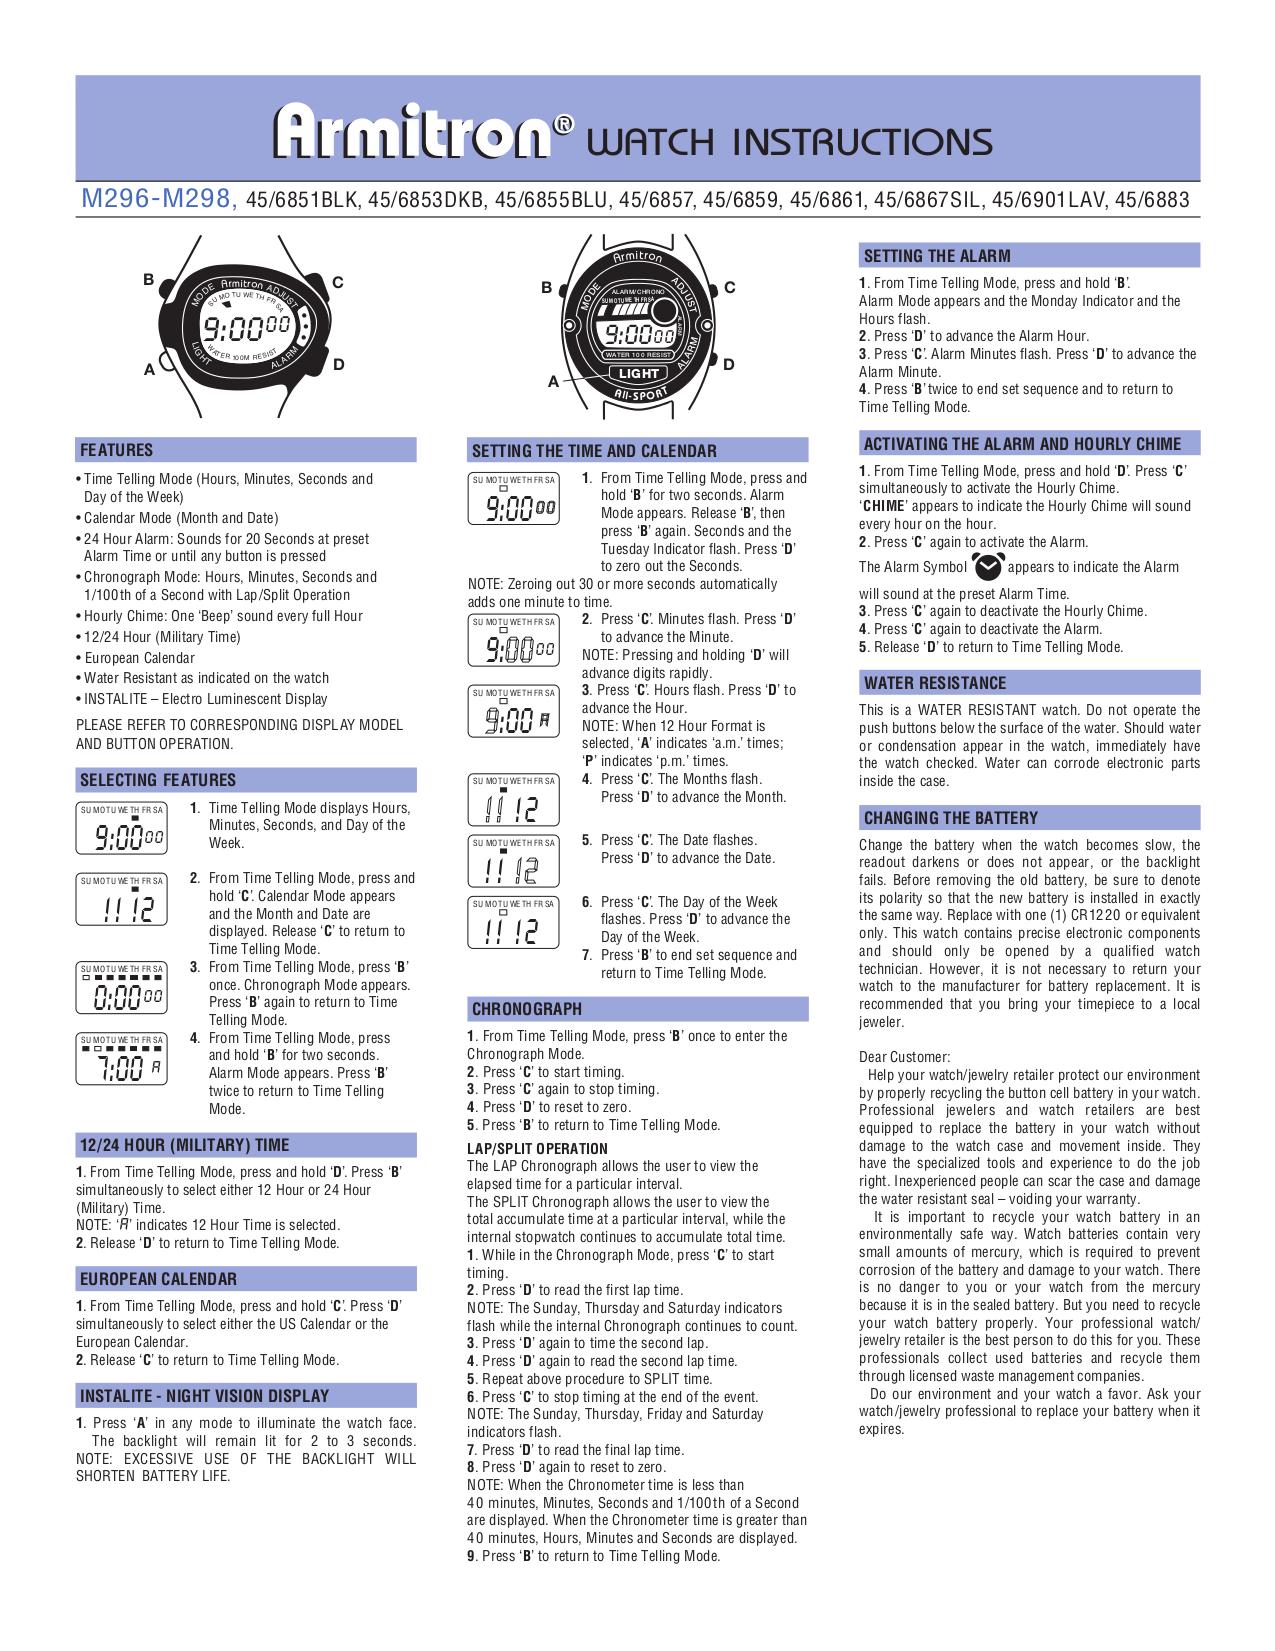 download free pdf for invicta pro diver 6986 watch manual rh umlib com invicta watch manual model 22235 invicta watch manual model 14330